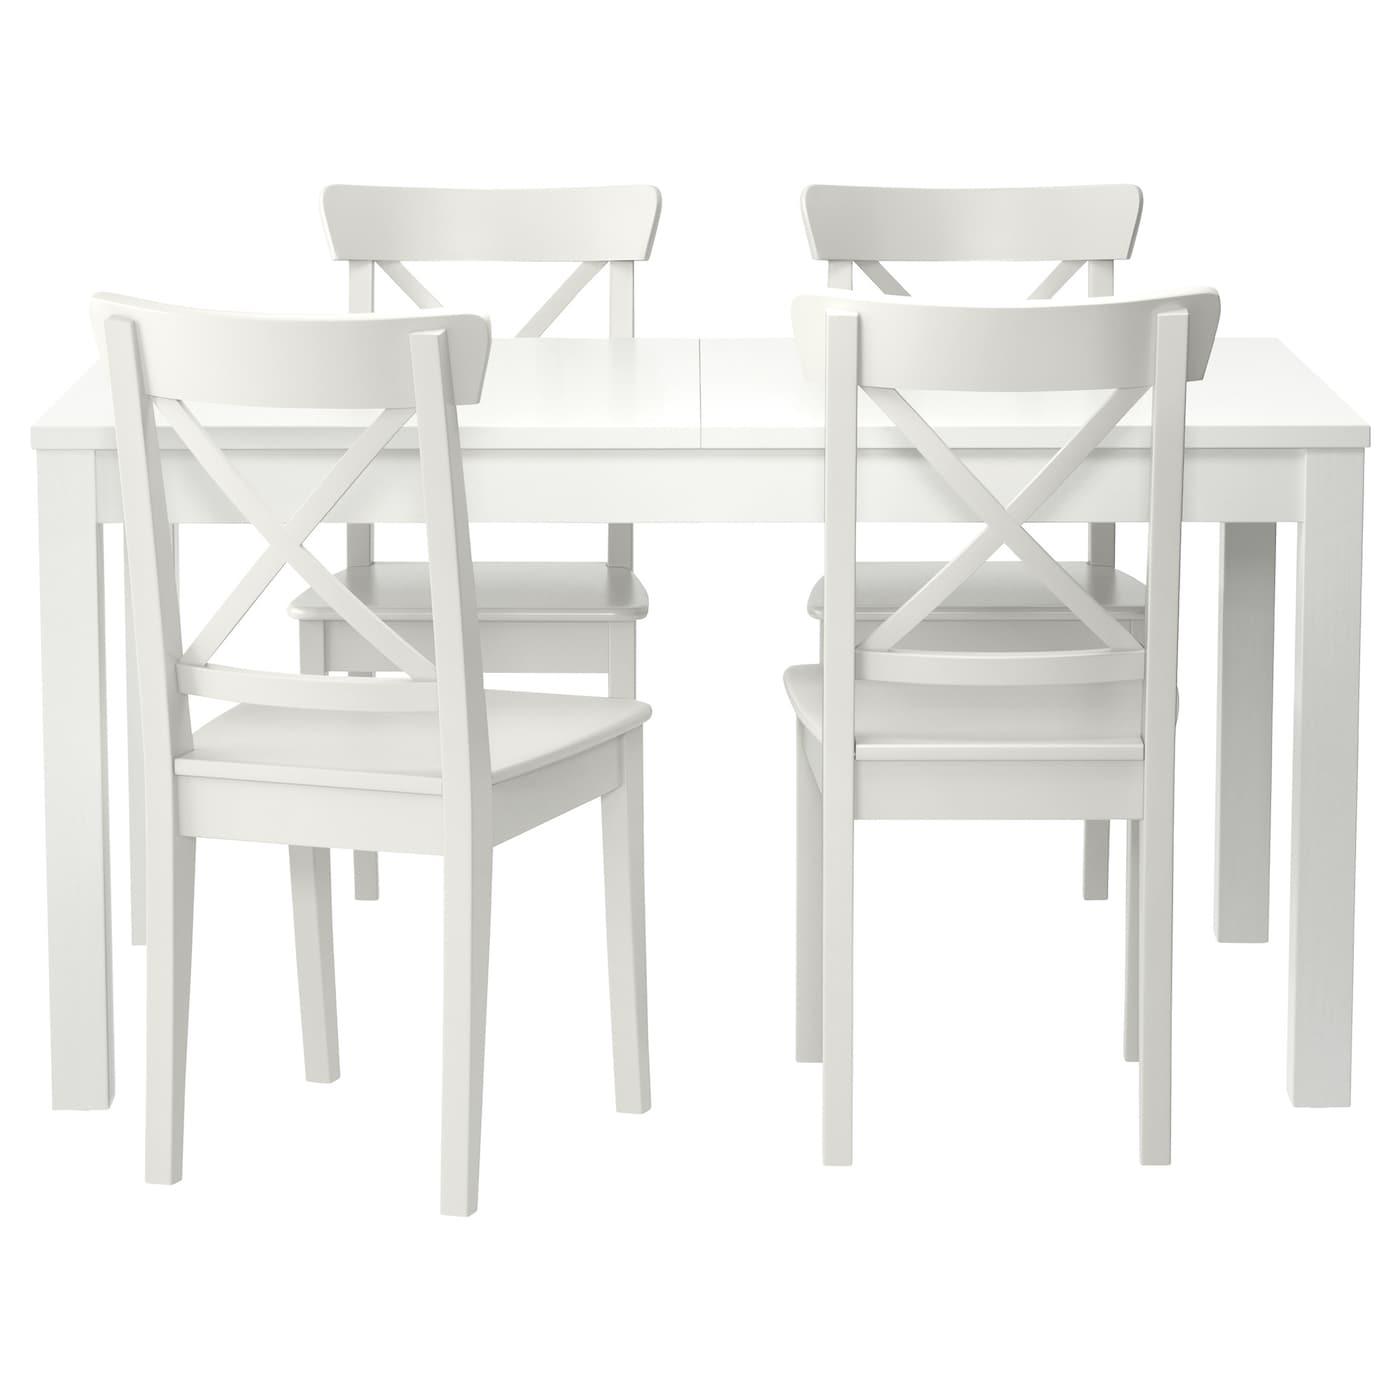 Dining table sets dining room sets ikea - Table reglable hauteur ikea ...